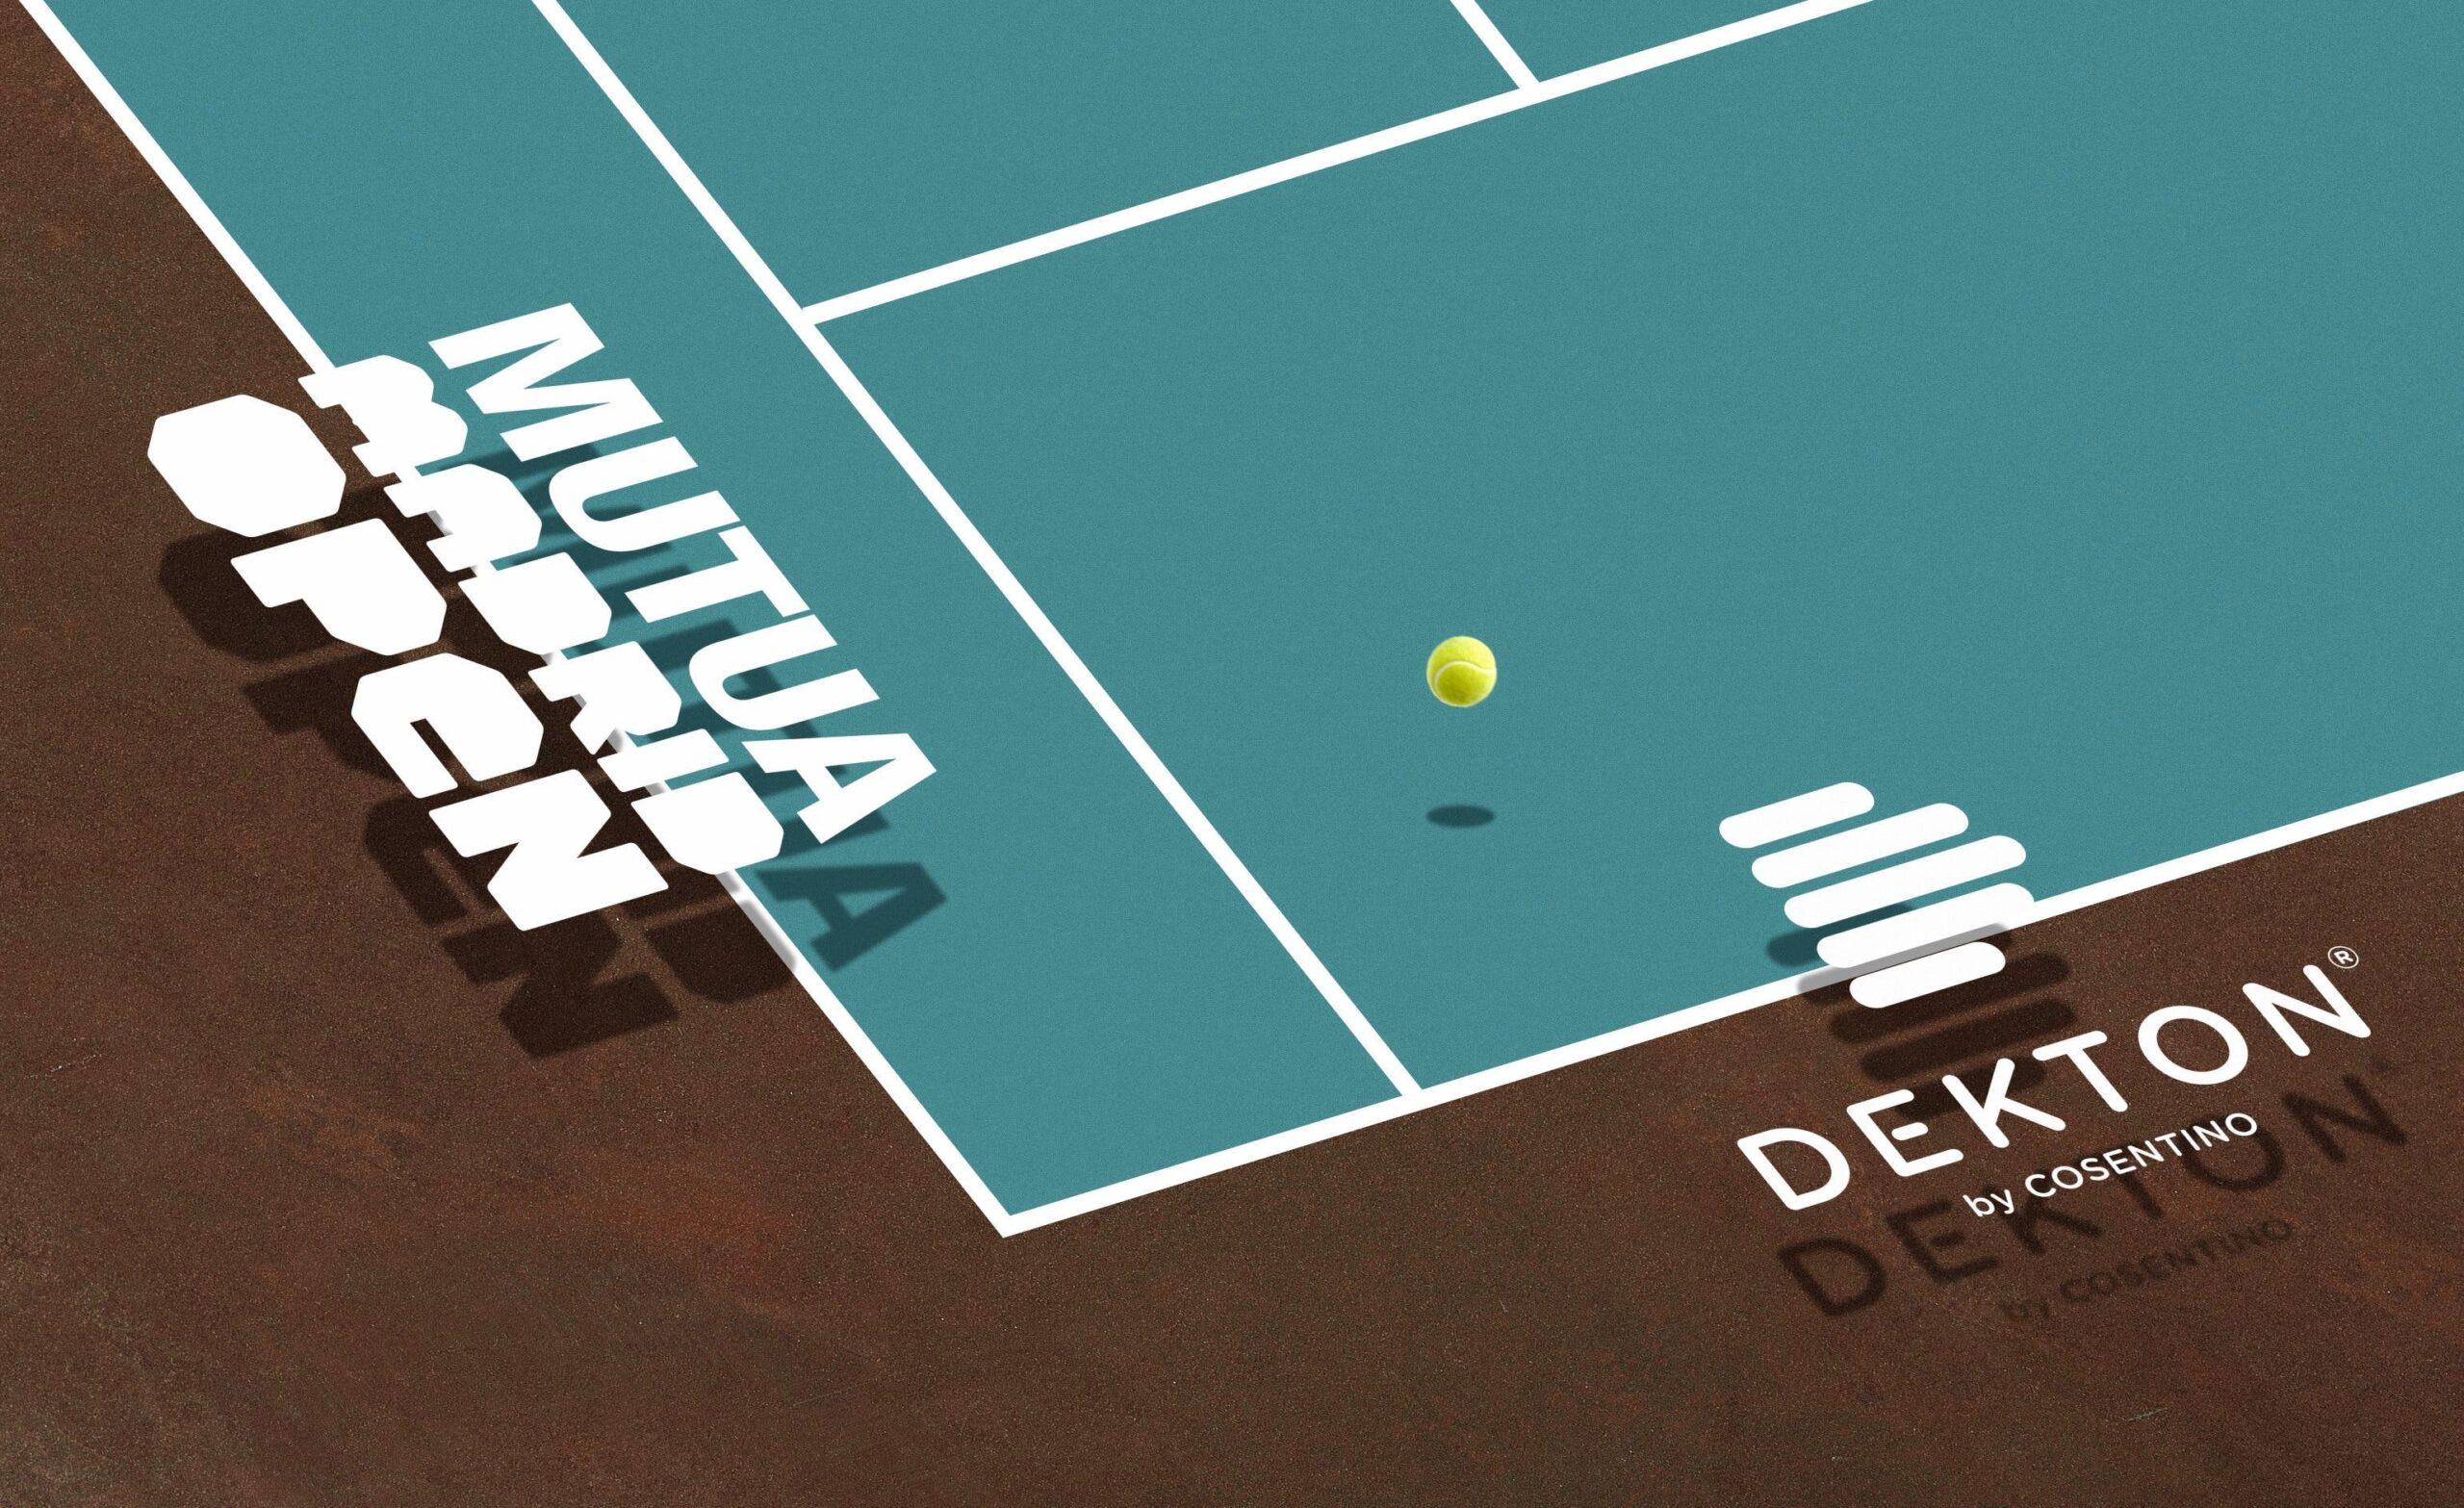 Image of Dekton by Cosentino Sponsor Mutua Madrid Open 2018 2 1 1 scaled in Dekton®, the 'top' sponsor of the Mutua Madrid Open 2018 - Cosentino